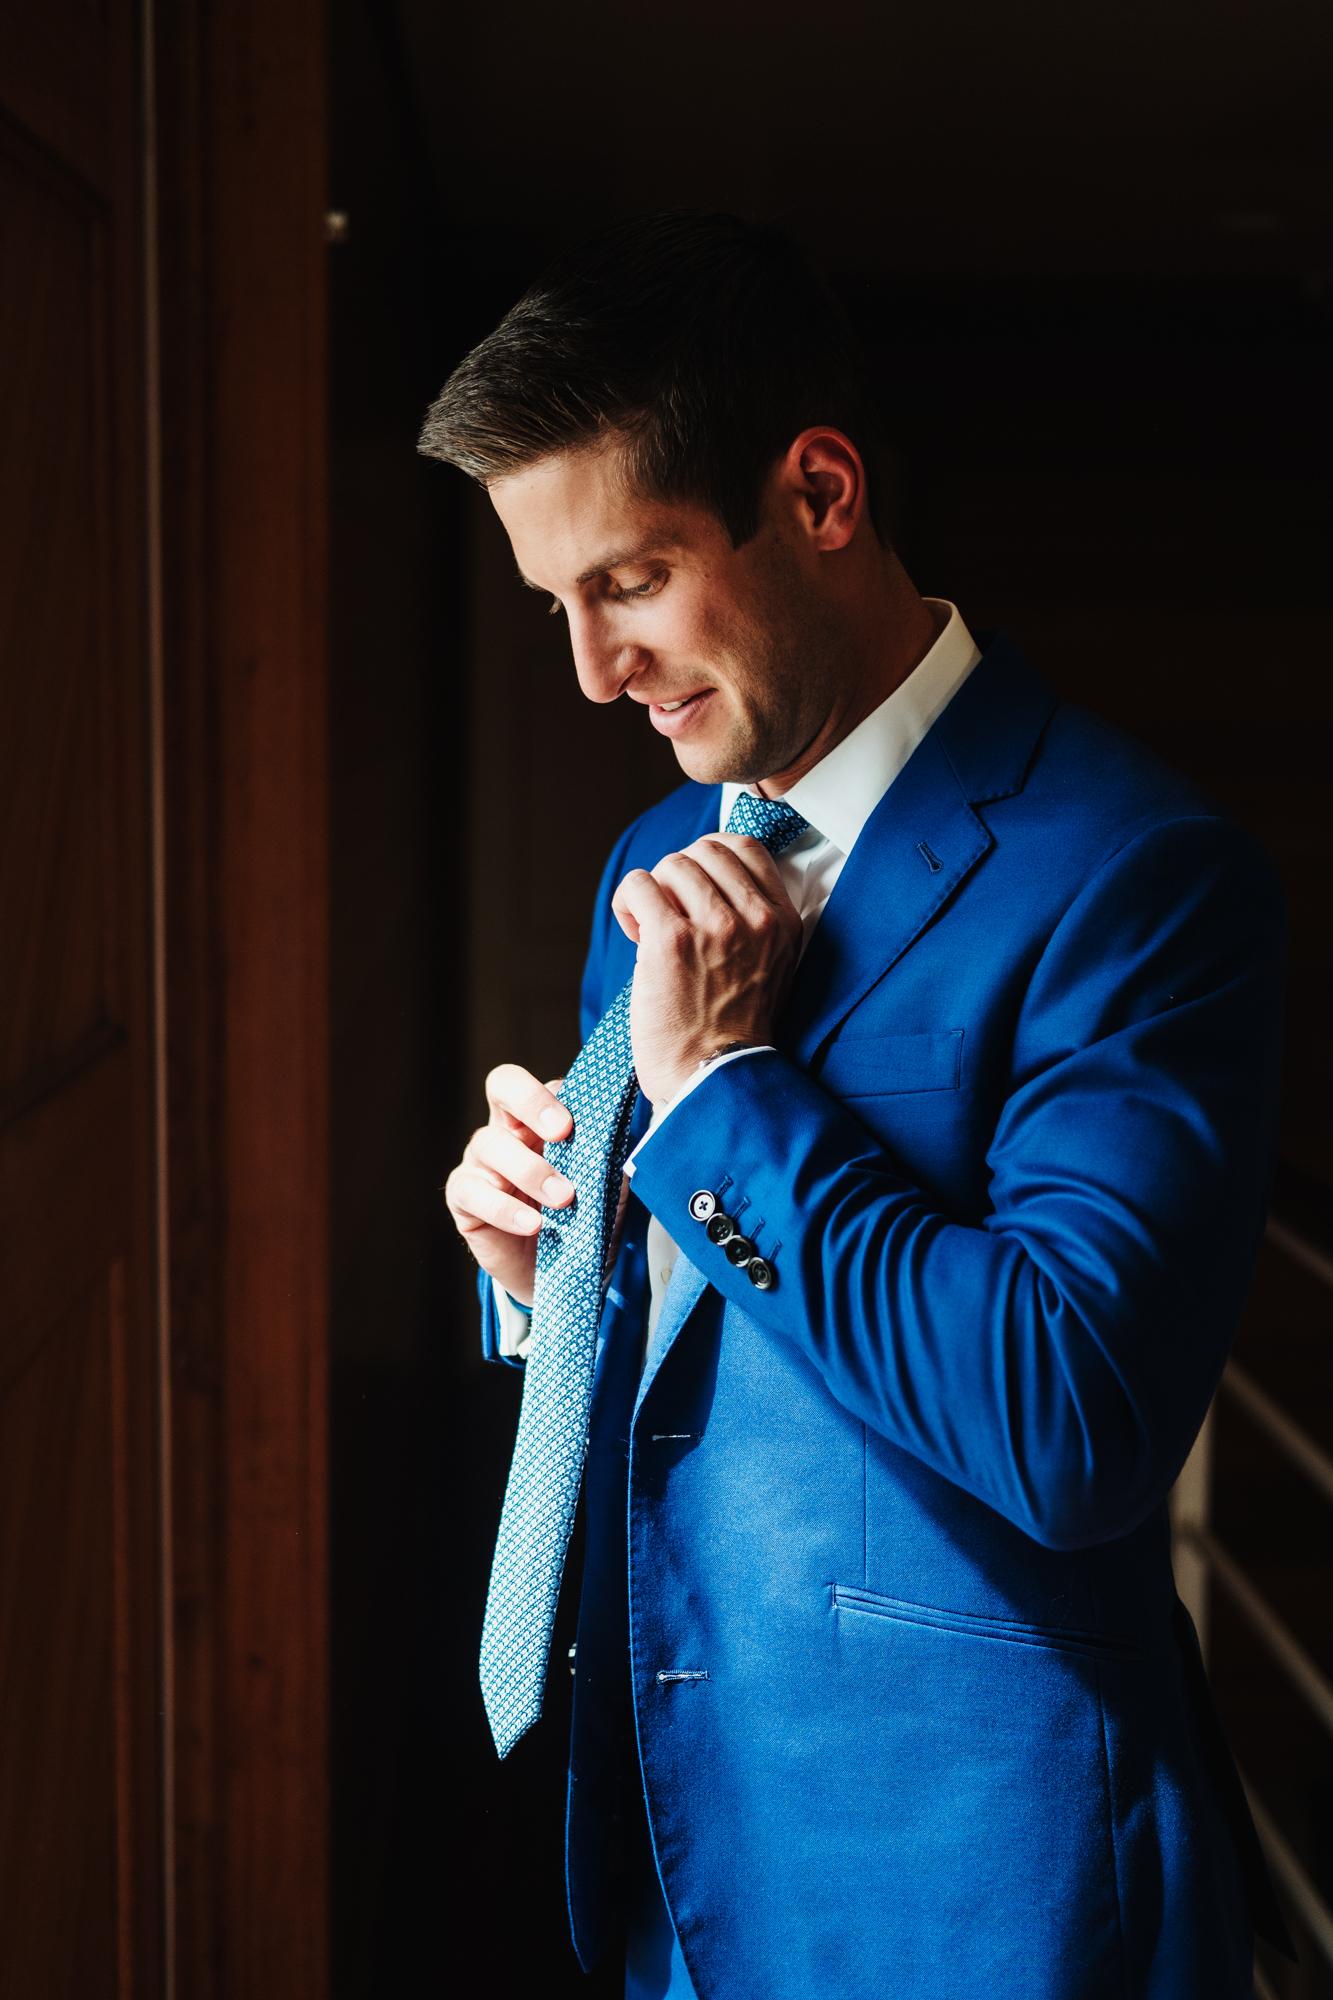 Wedding_Francis_Boucher_Jonathan_Edwards_Winery_2018-17.jpg